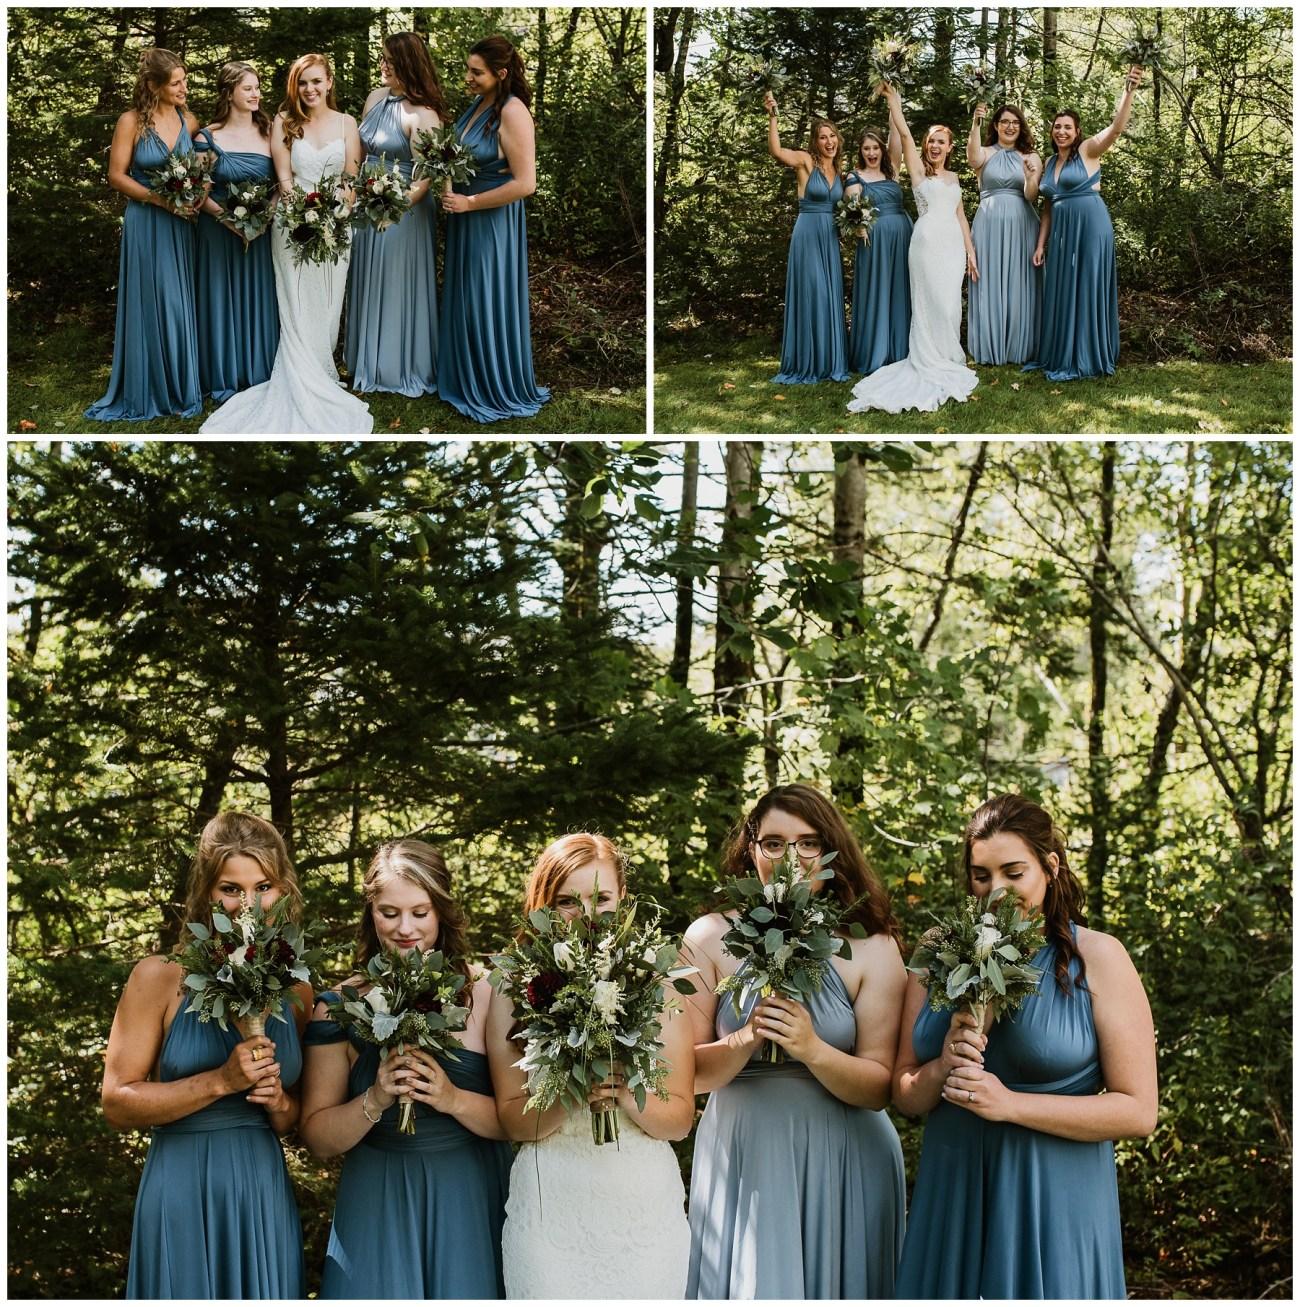 intimate-backyard-wedding-chester-nova-scotia_25.jpg